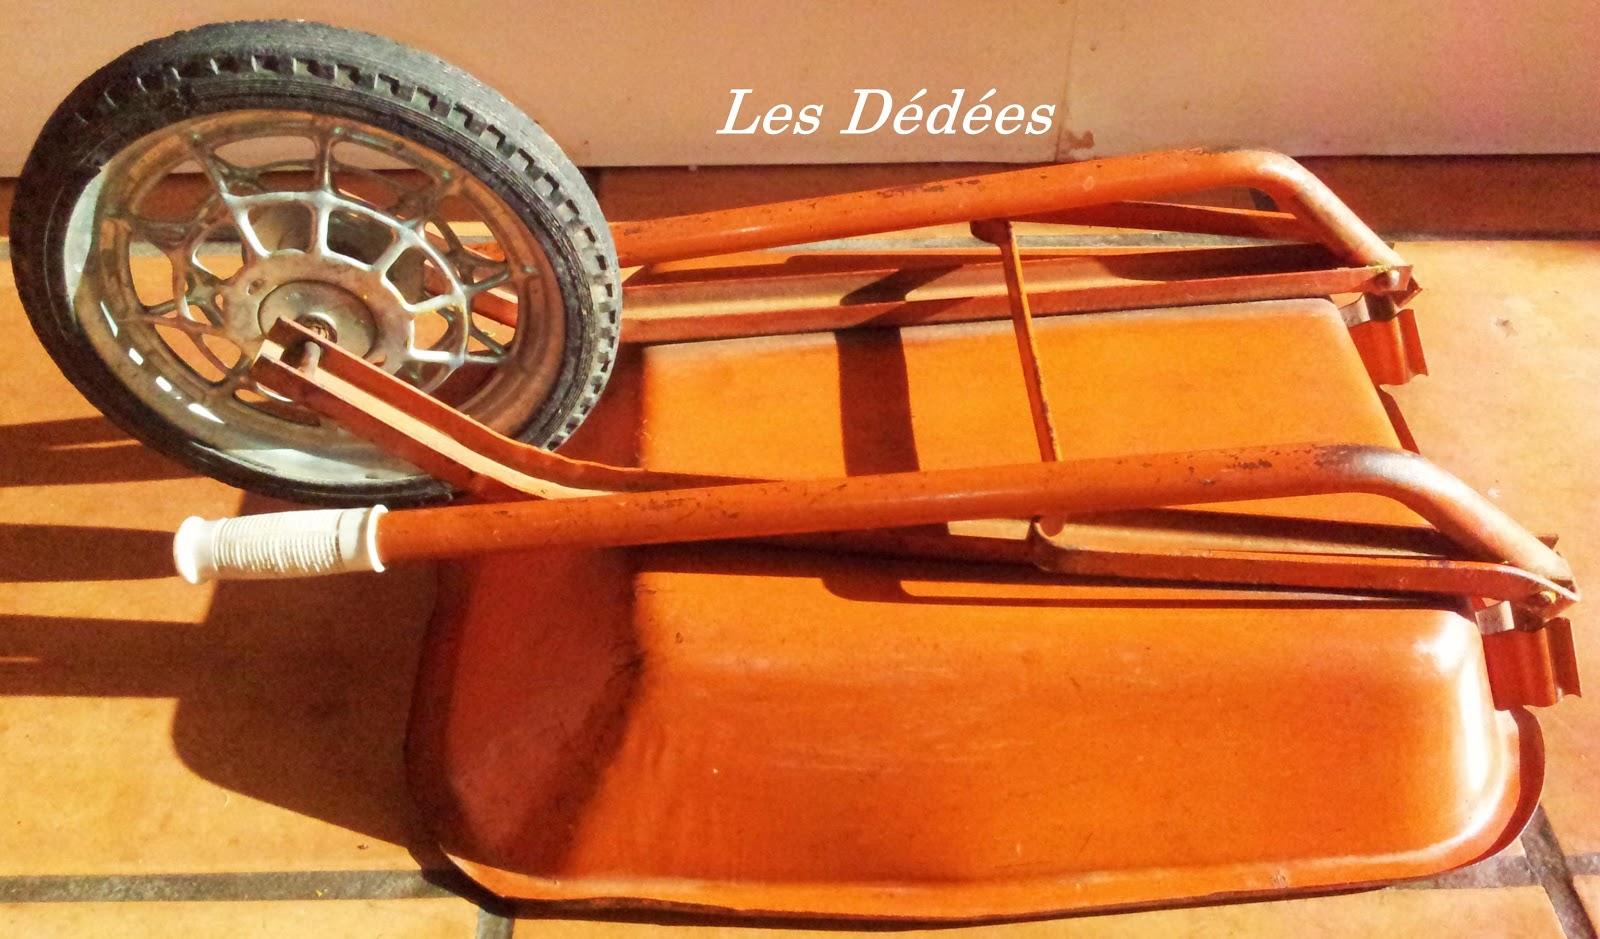 Les Dedees Vintage Recup Creations Ancienne Brouette